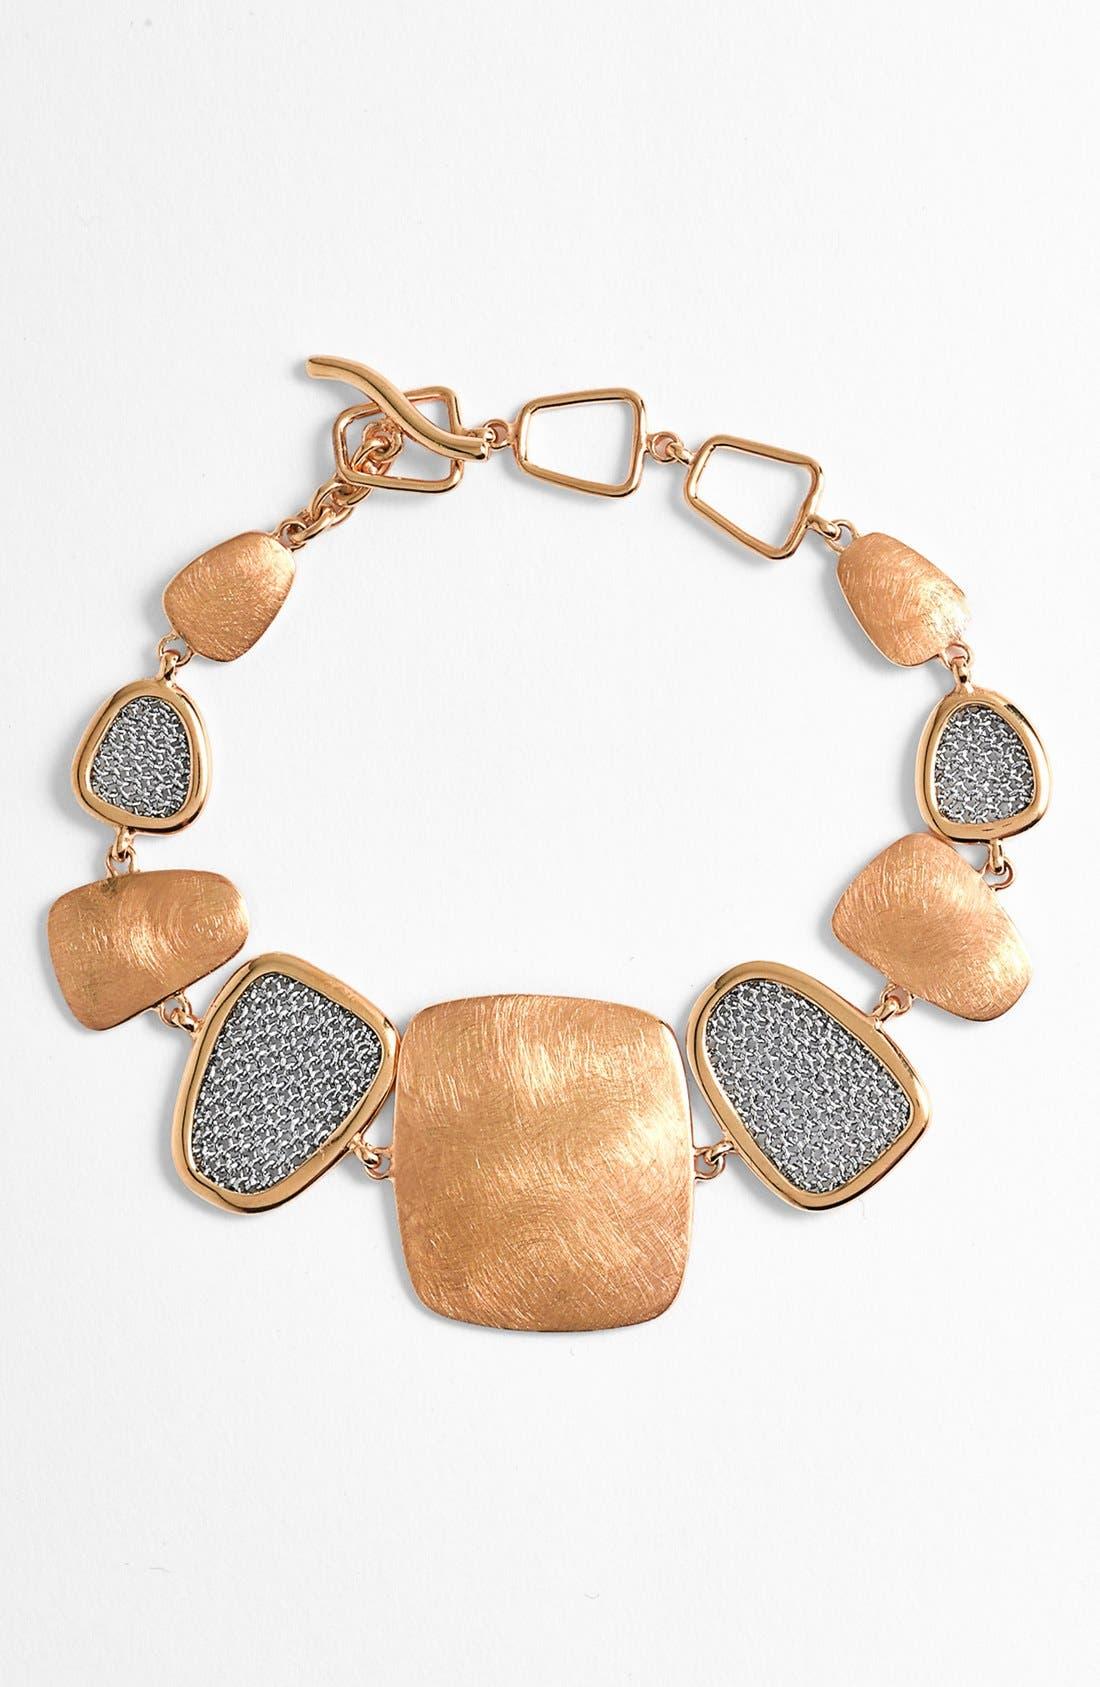 Alternate Image 1 Selected - Adami & Martucci 'Dune' Toggle Bracelet